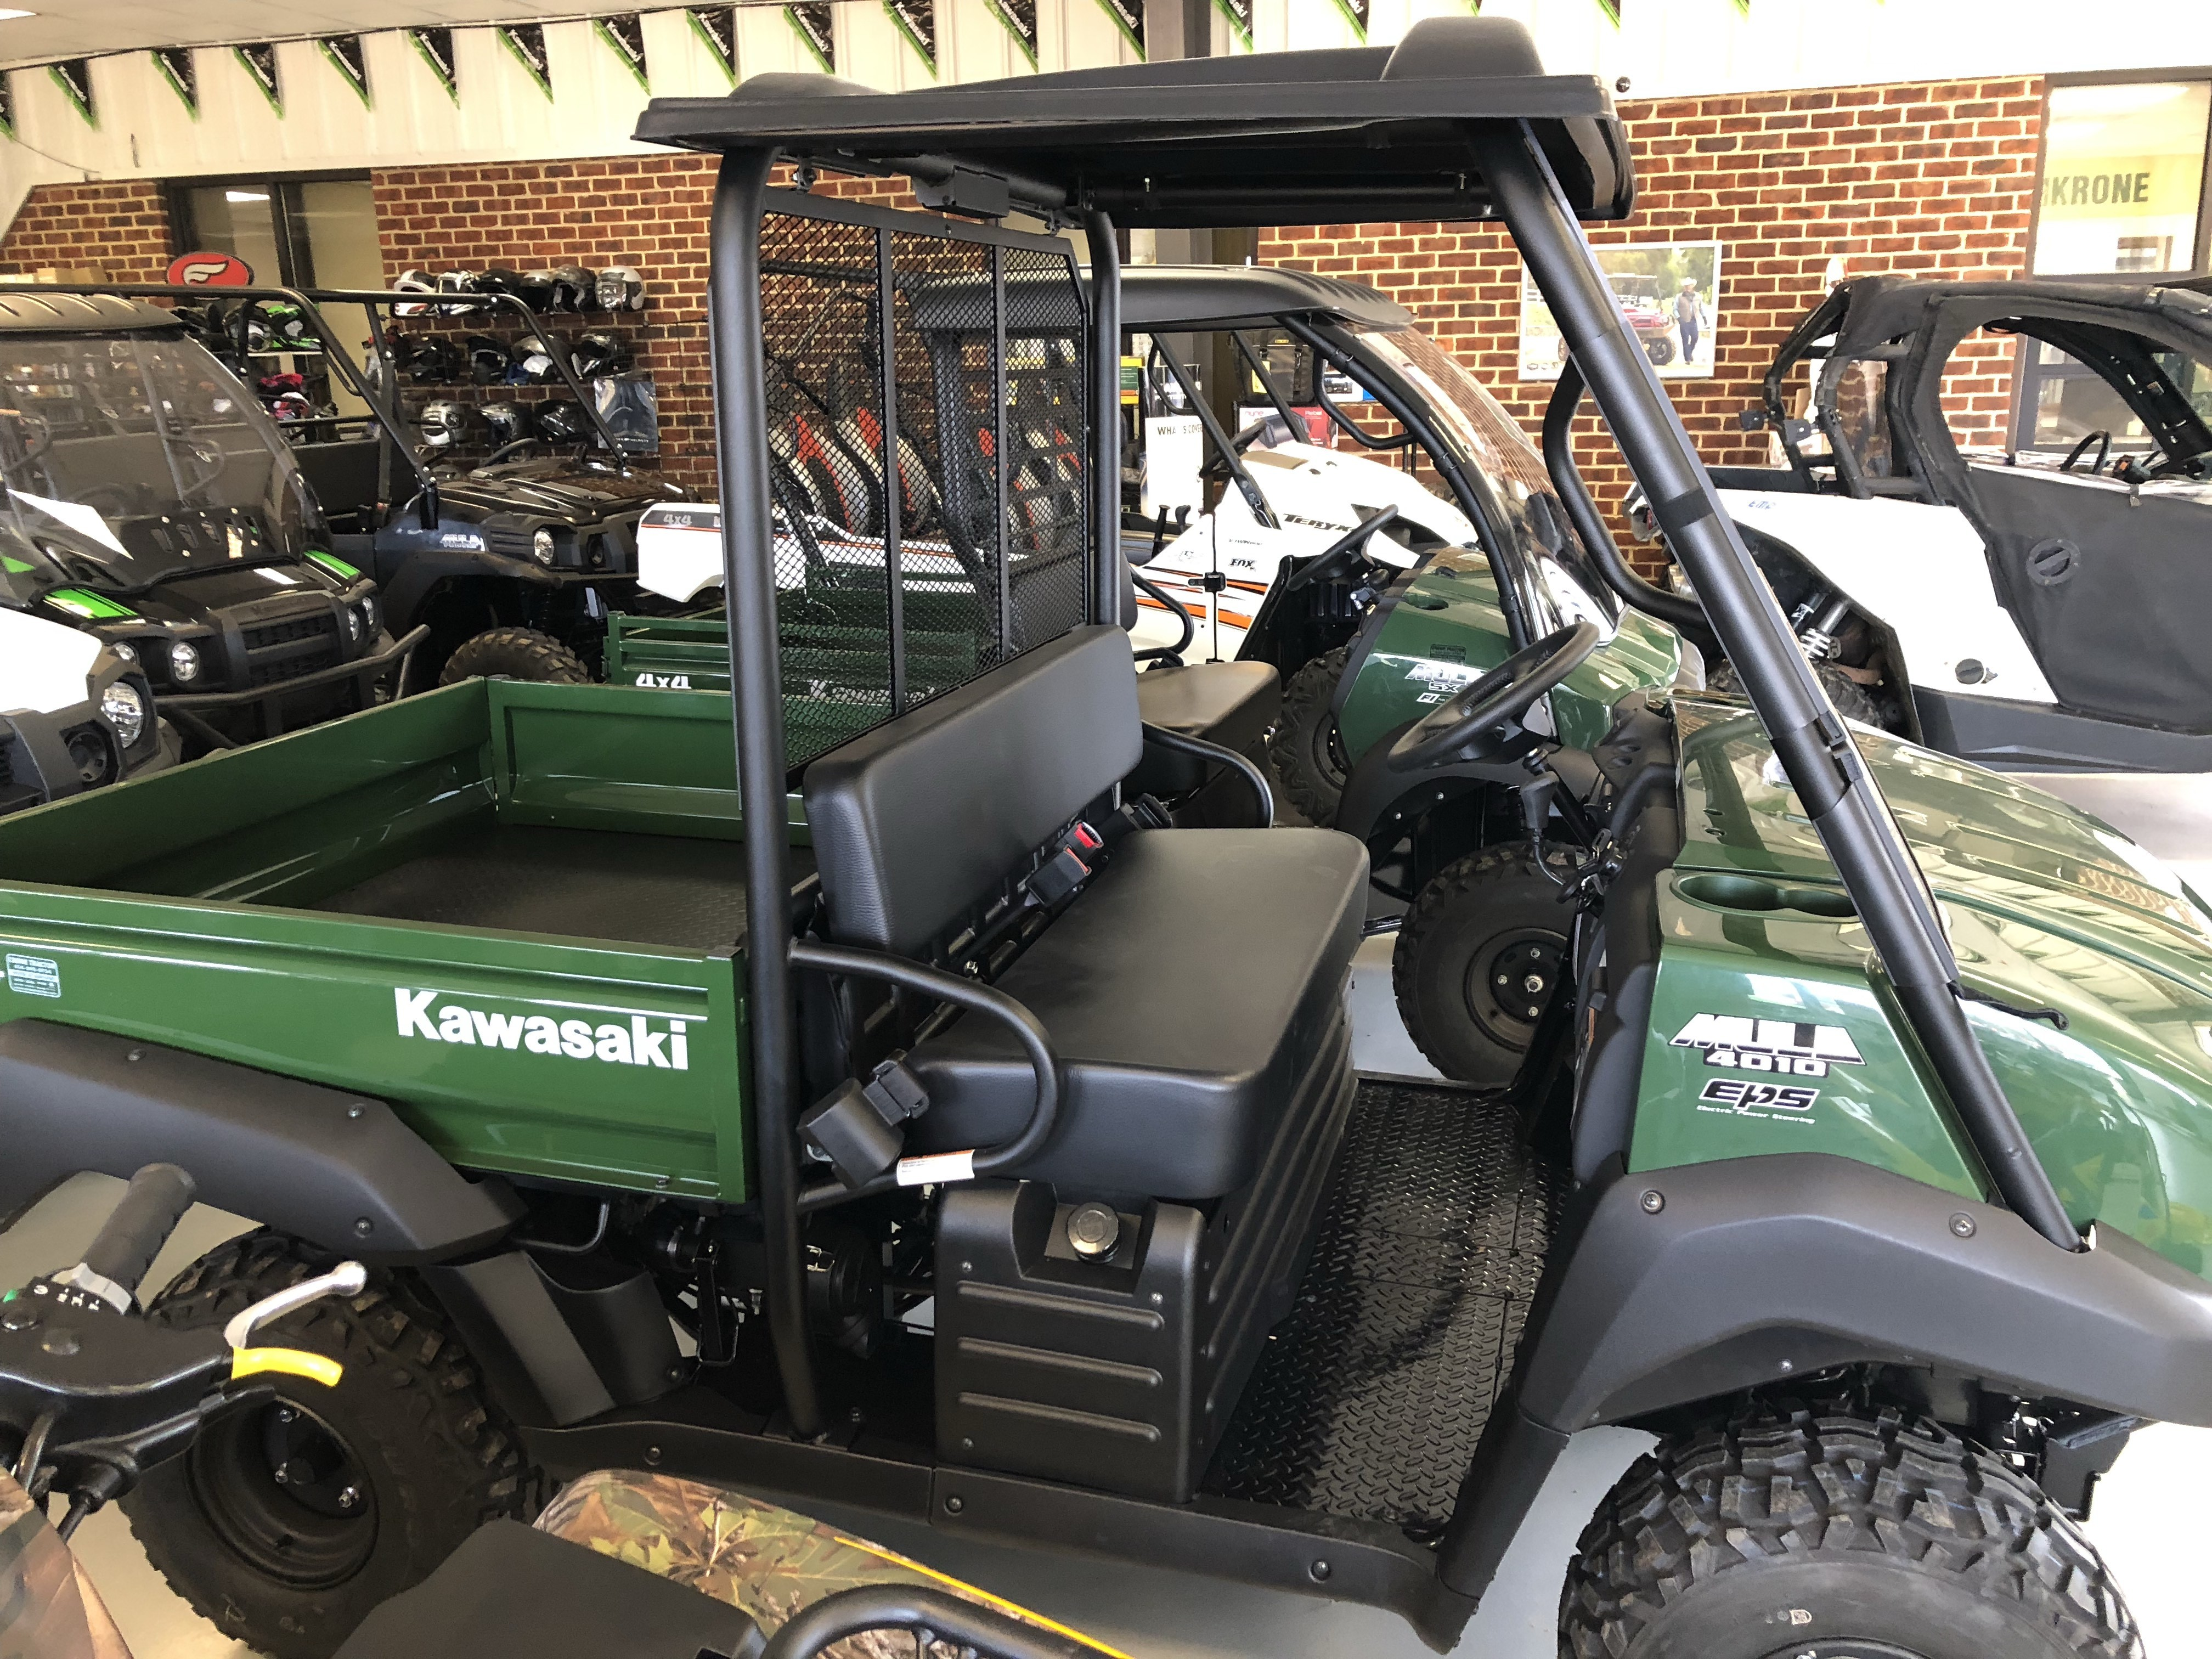 New 2019 Kawasaki Mule™ 4010 4x4 in Crewe, VA